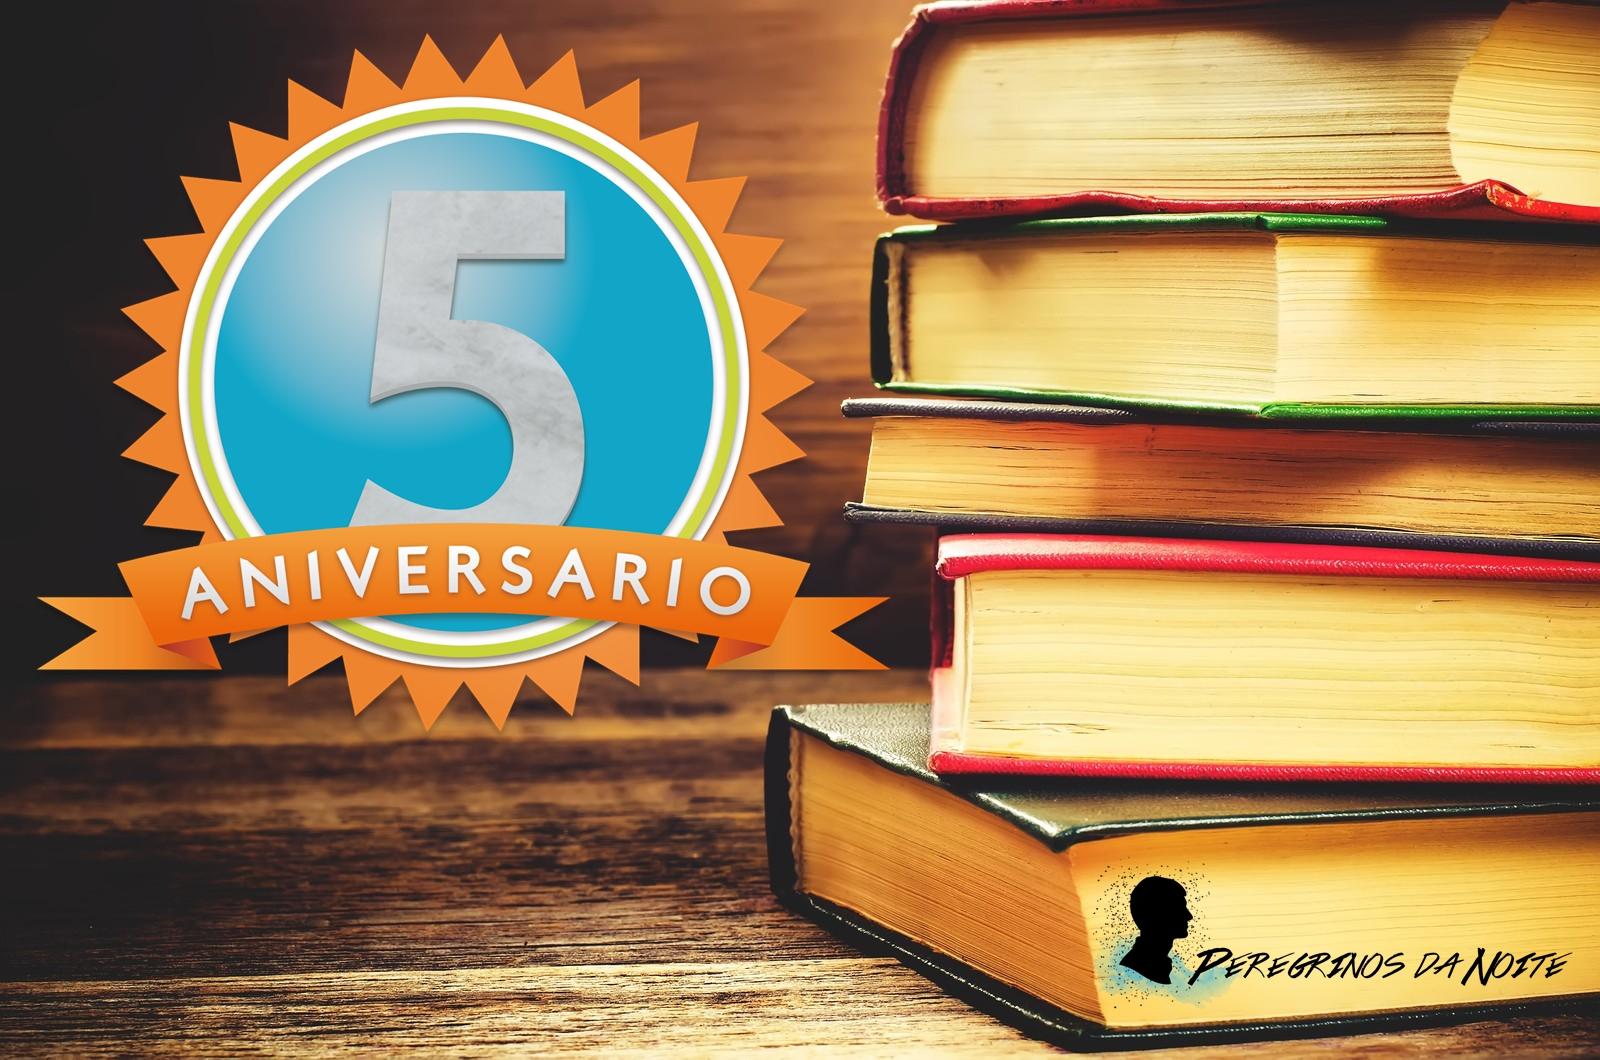 5 anos do Peregrino